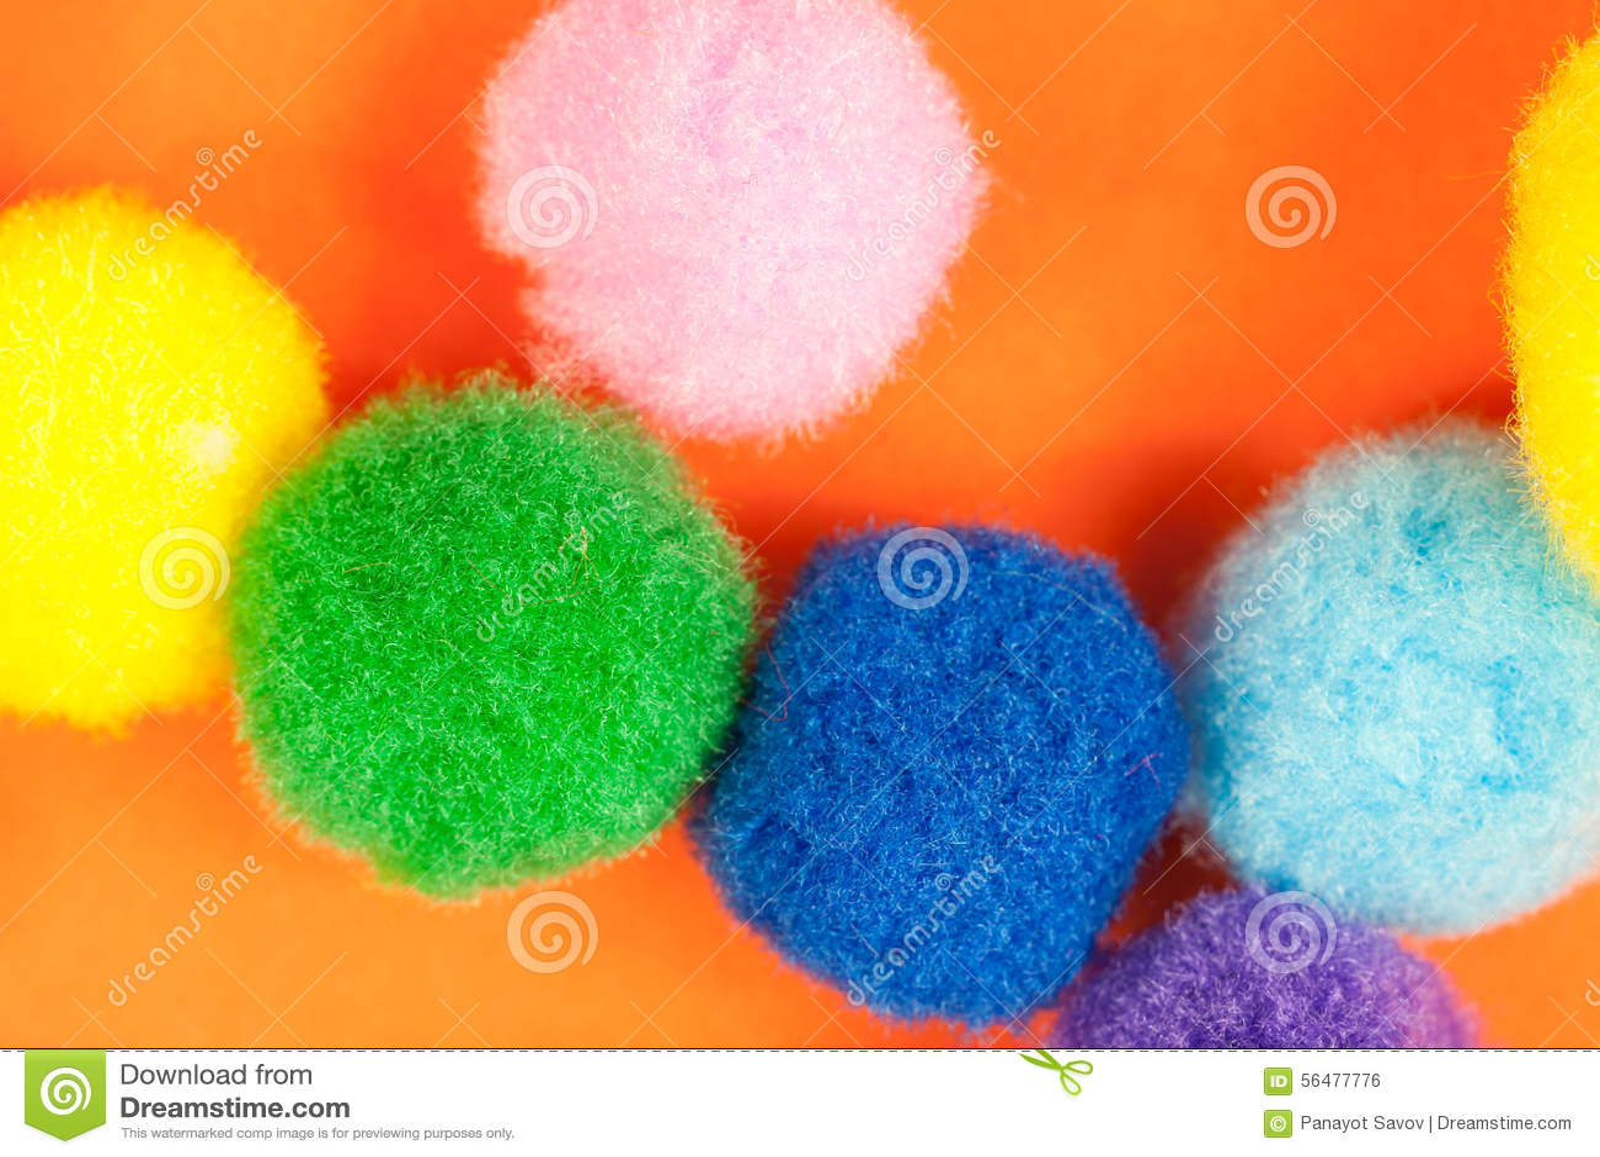 Arranjo de bolas macias de matéria têxtil distorcido macia colorida vívida no fundo de papel alaranjado vibrante